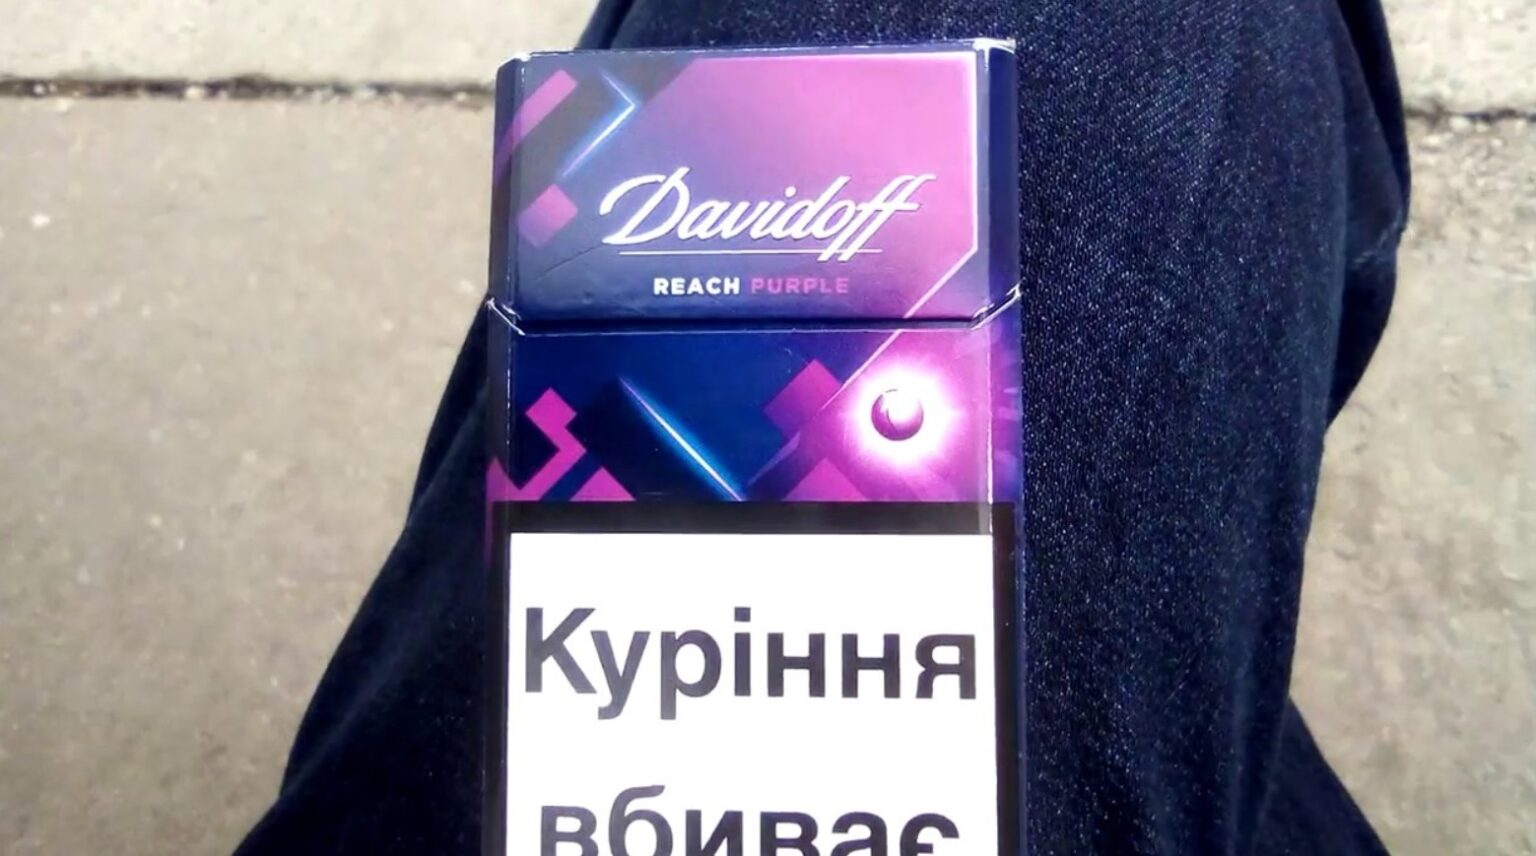 DAVIDOFF Reach Purple